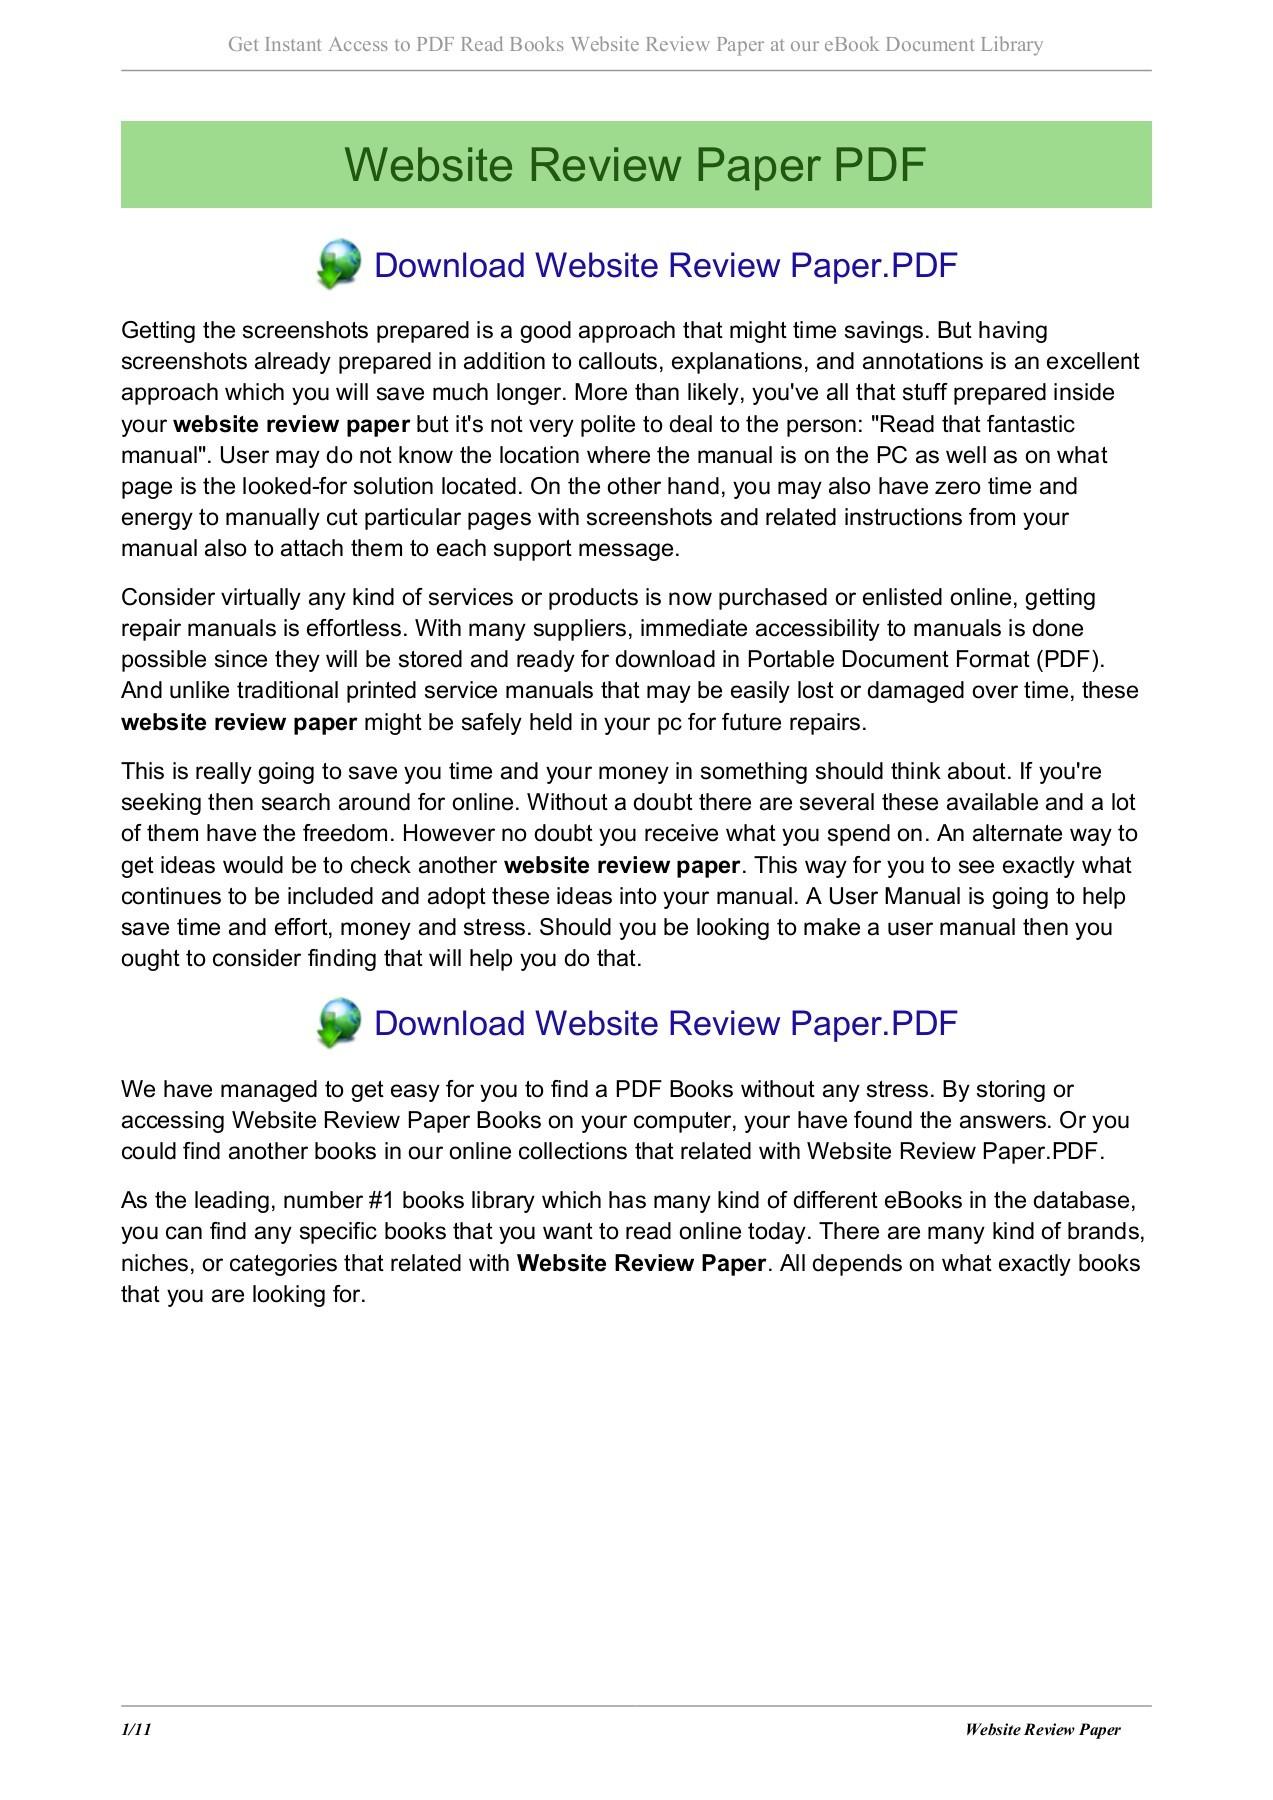 answer key chemistry 1410 final examrevit user manual rh answer key chemistry 1410 final examrevit use